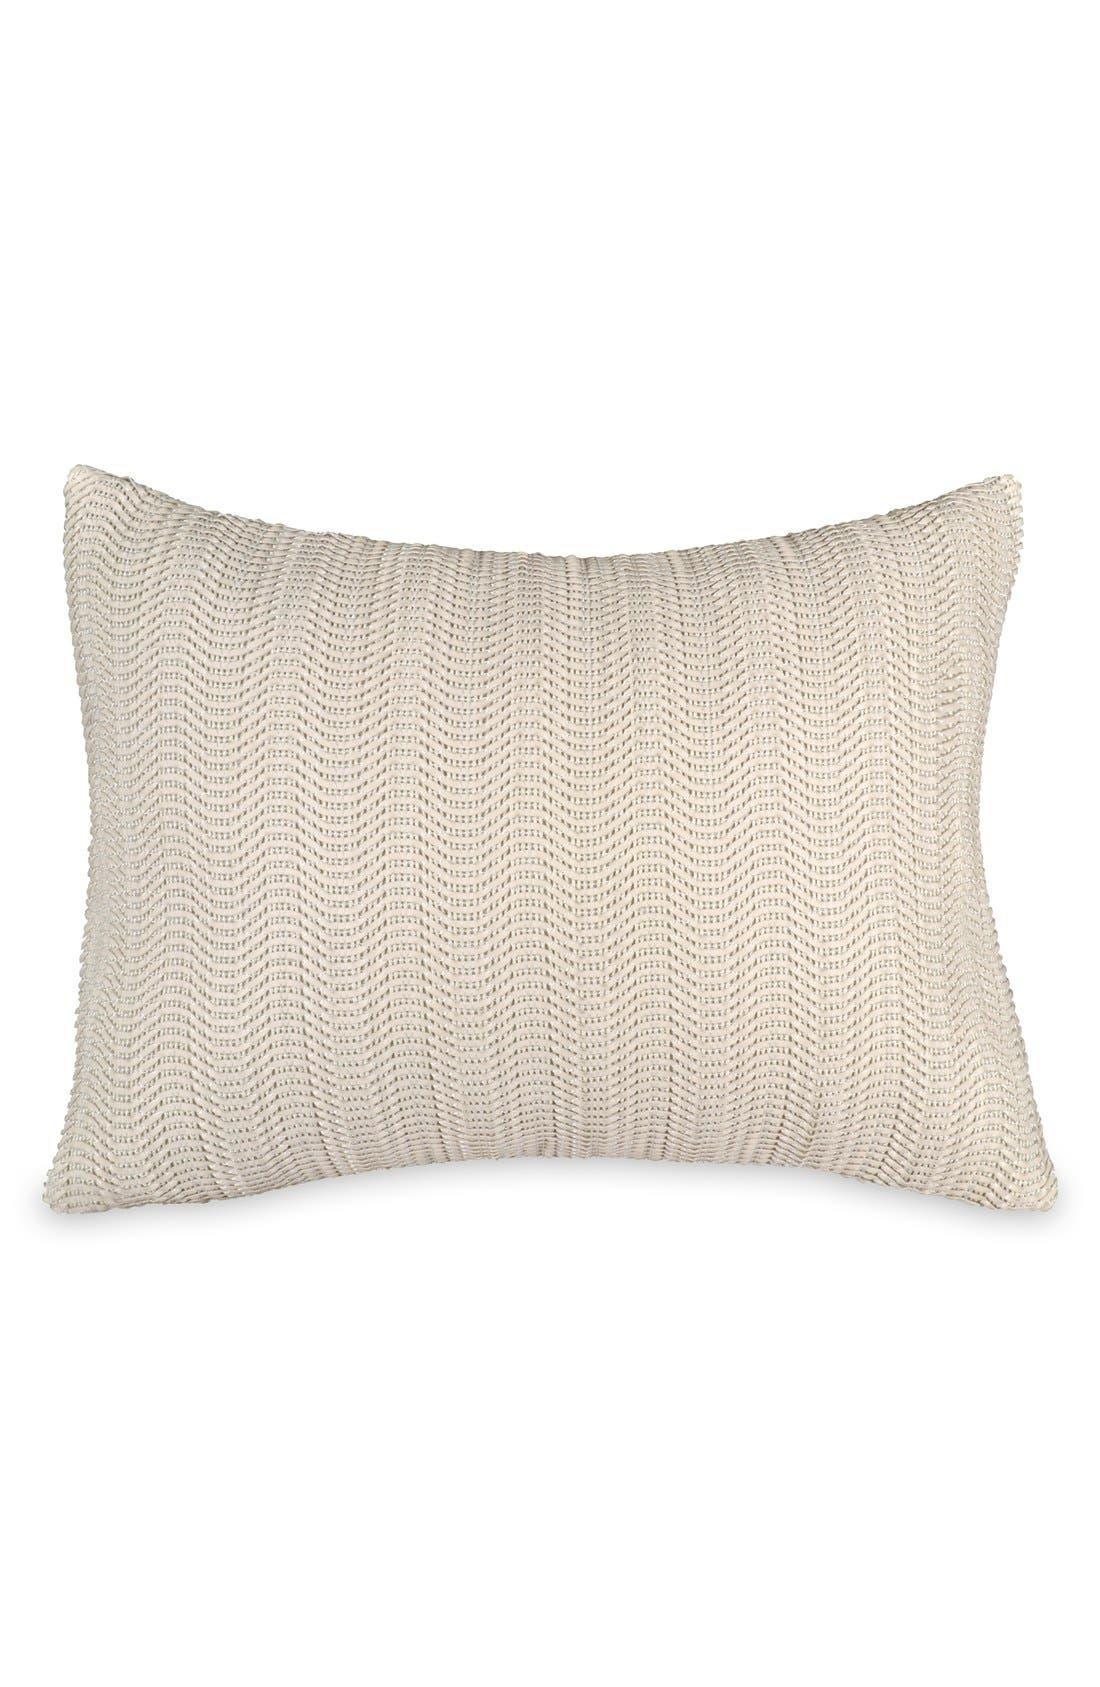 Donna Karan Collection 'Moonscape' Woven Pillow,                             Main thumbnail 1, color,                             Ivory